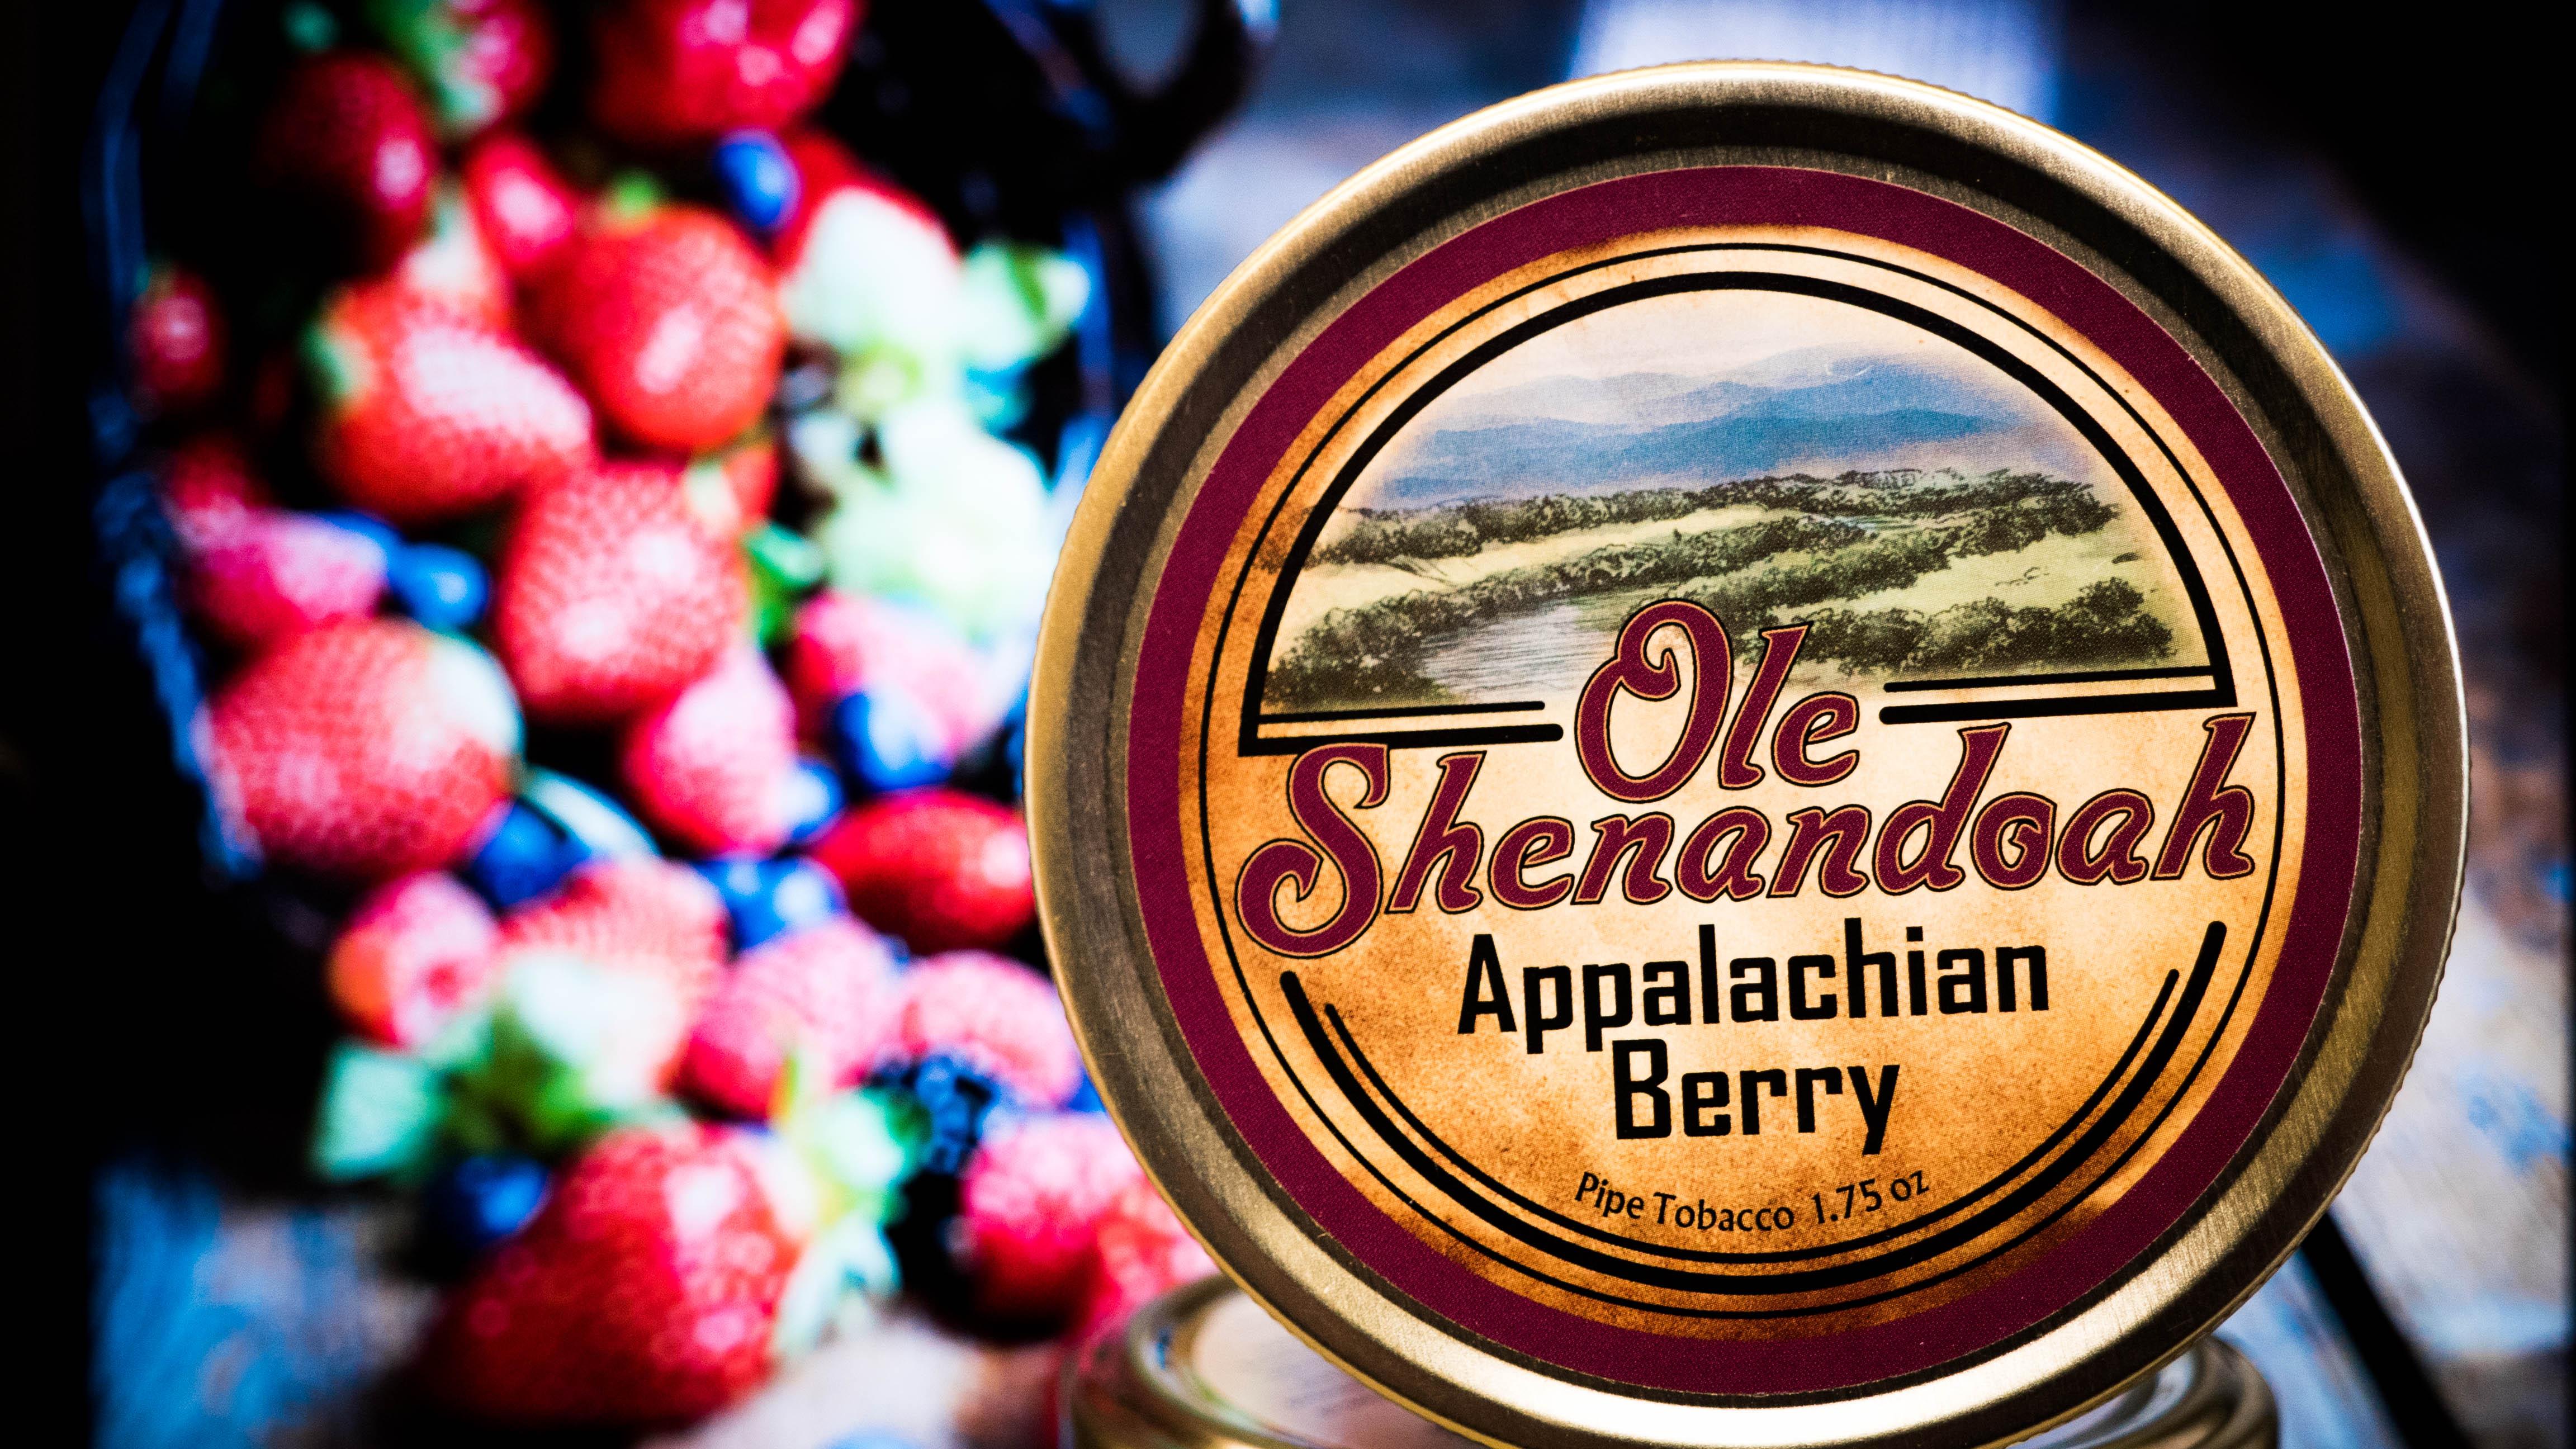 Appalachian Berry